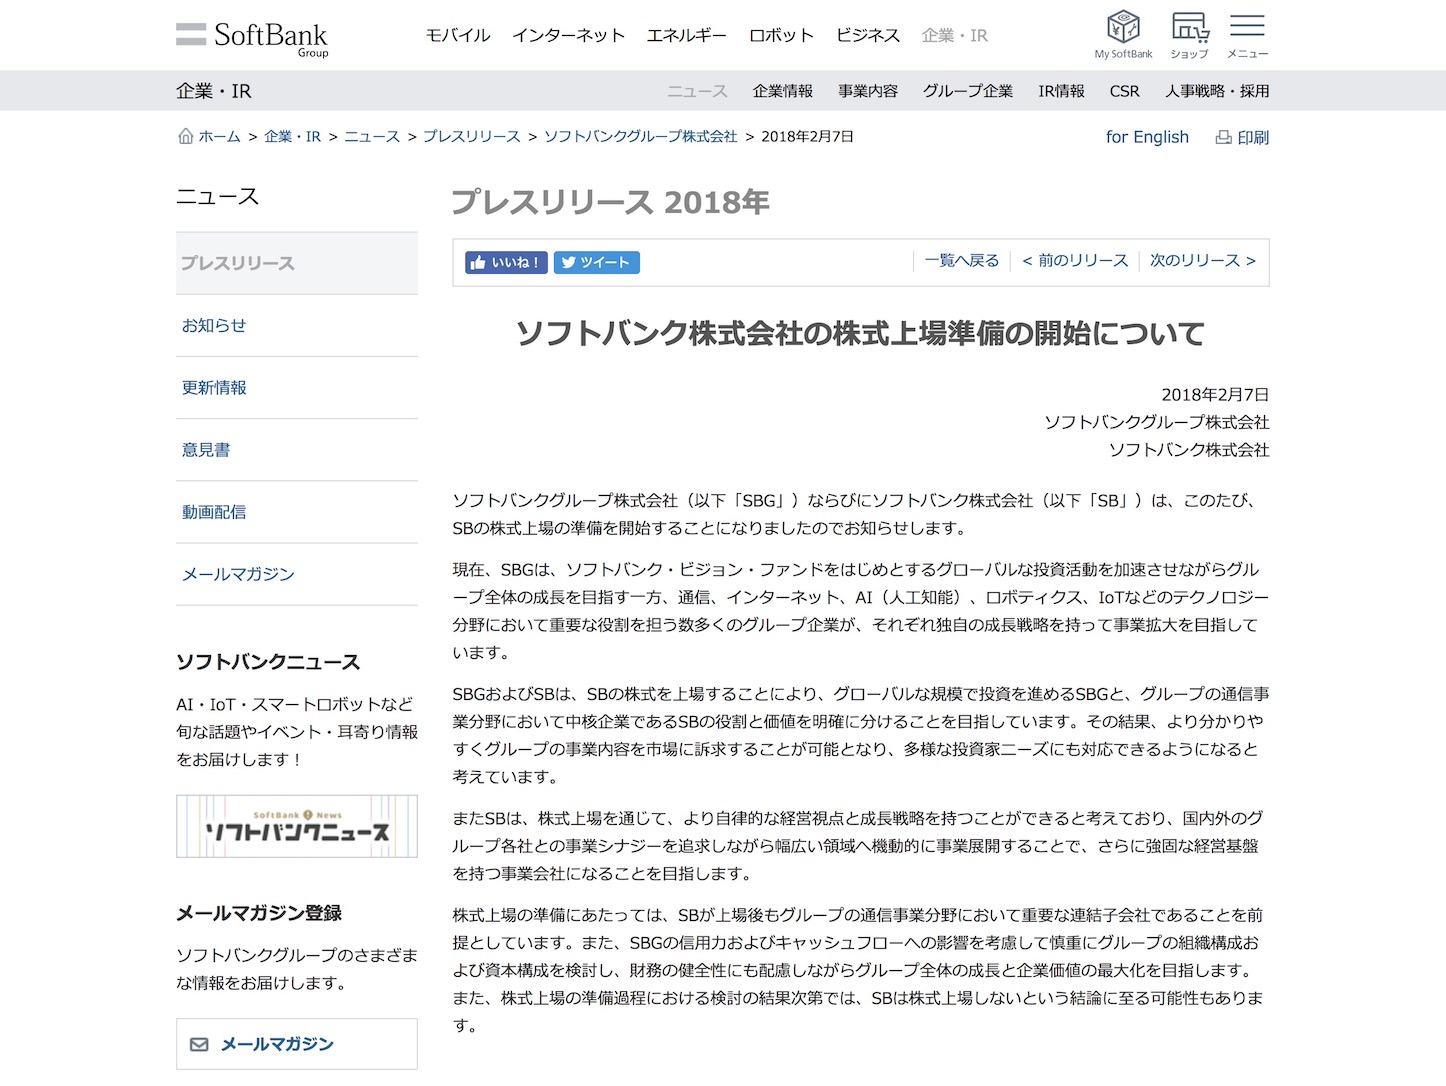 Softbank-Listing.jpg